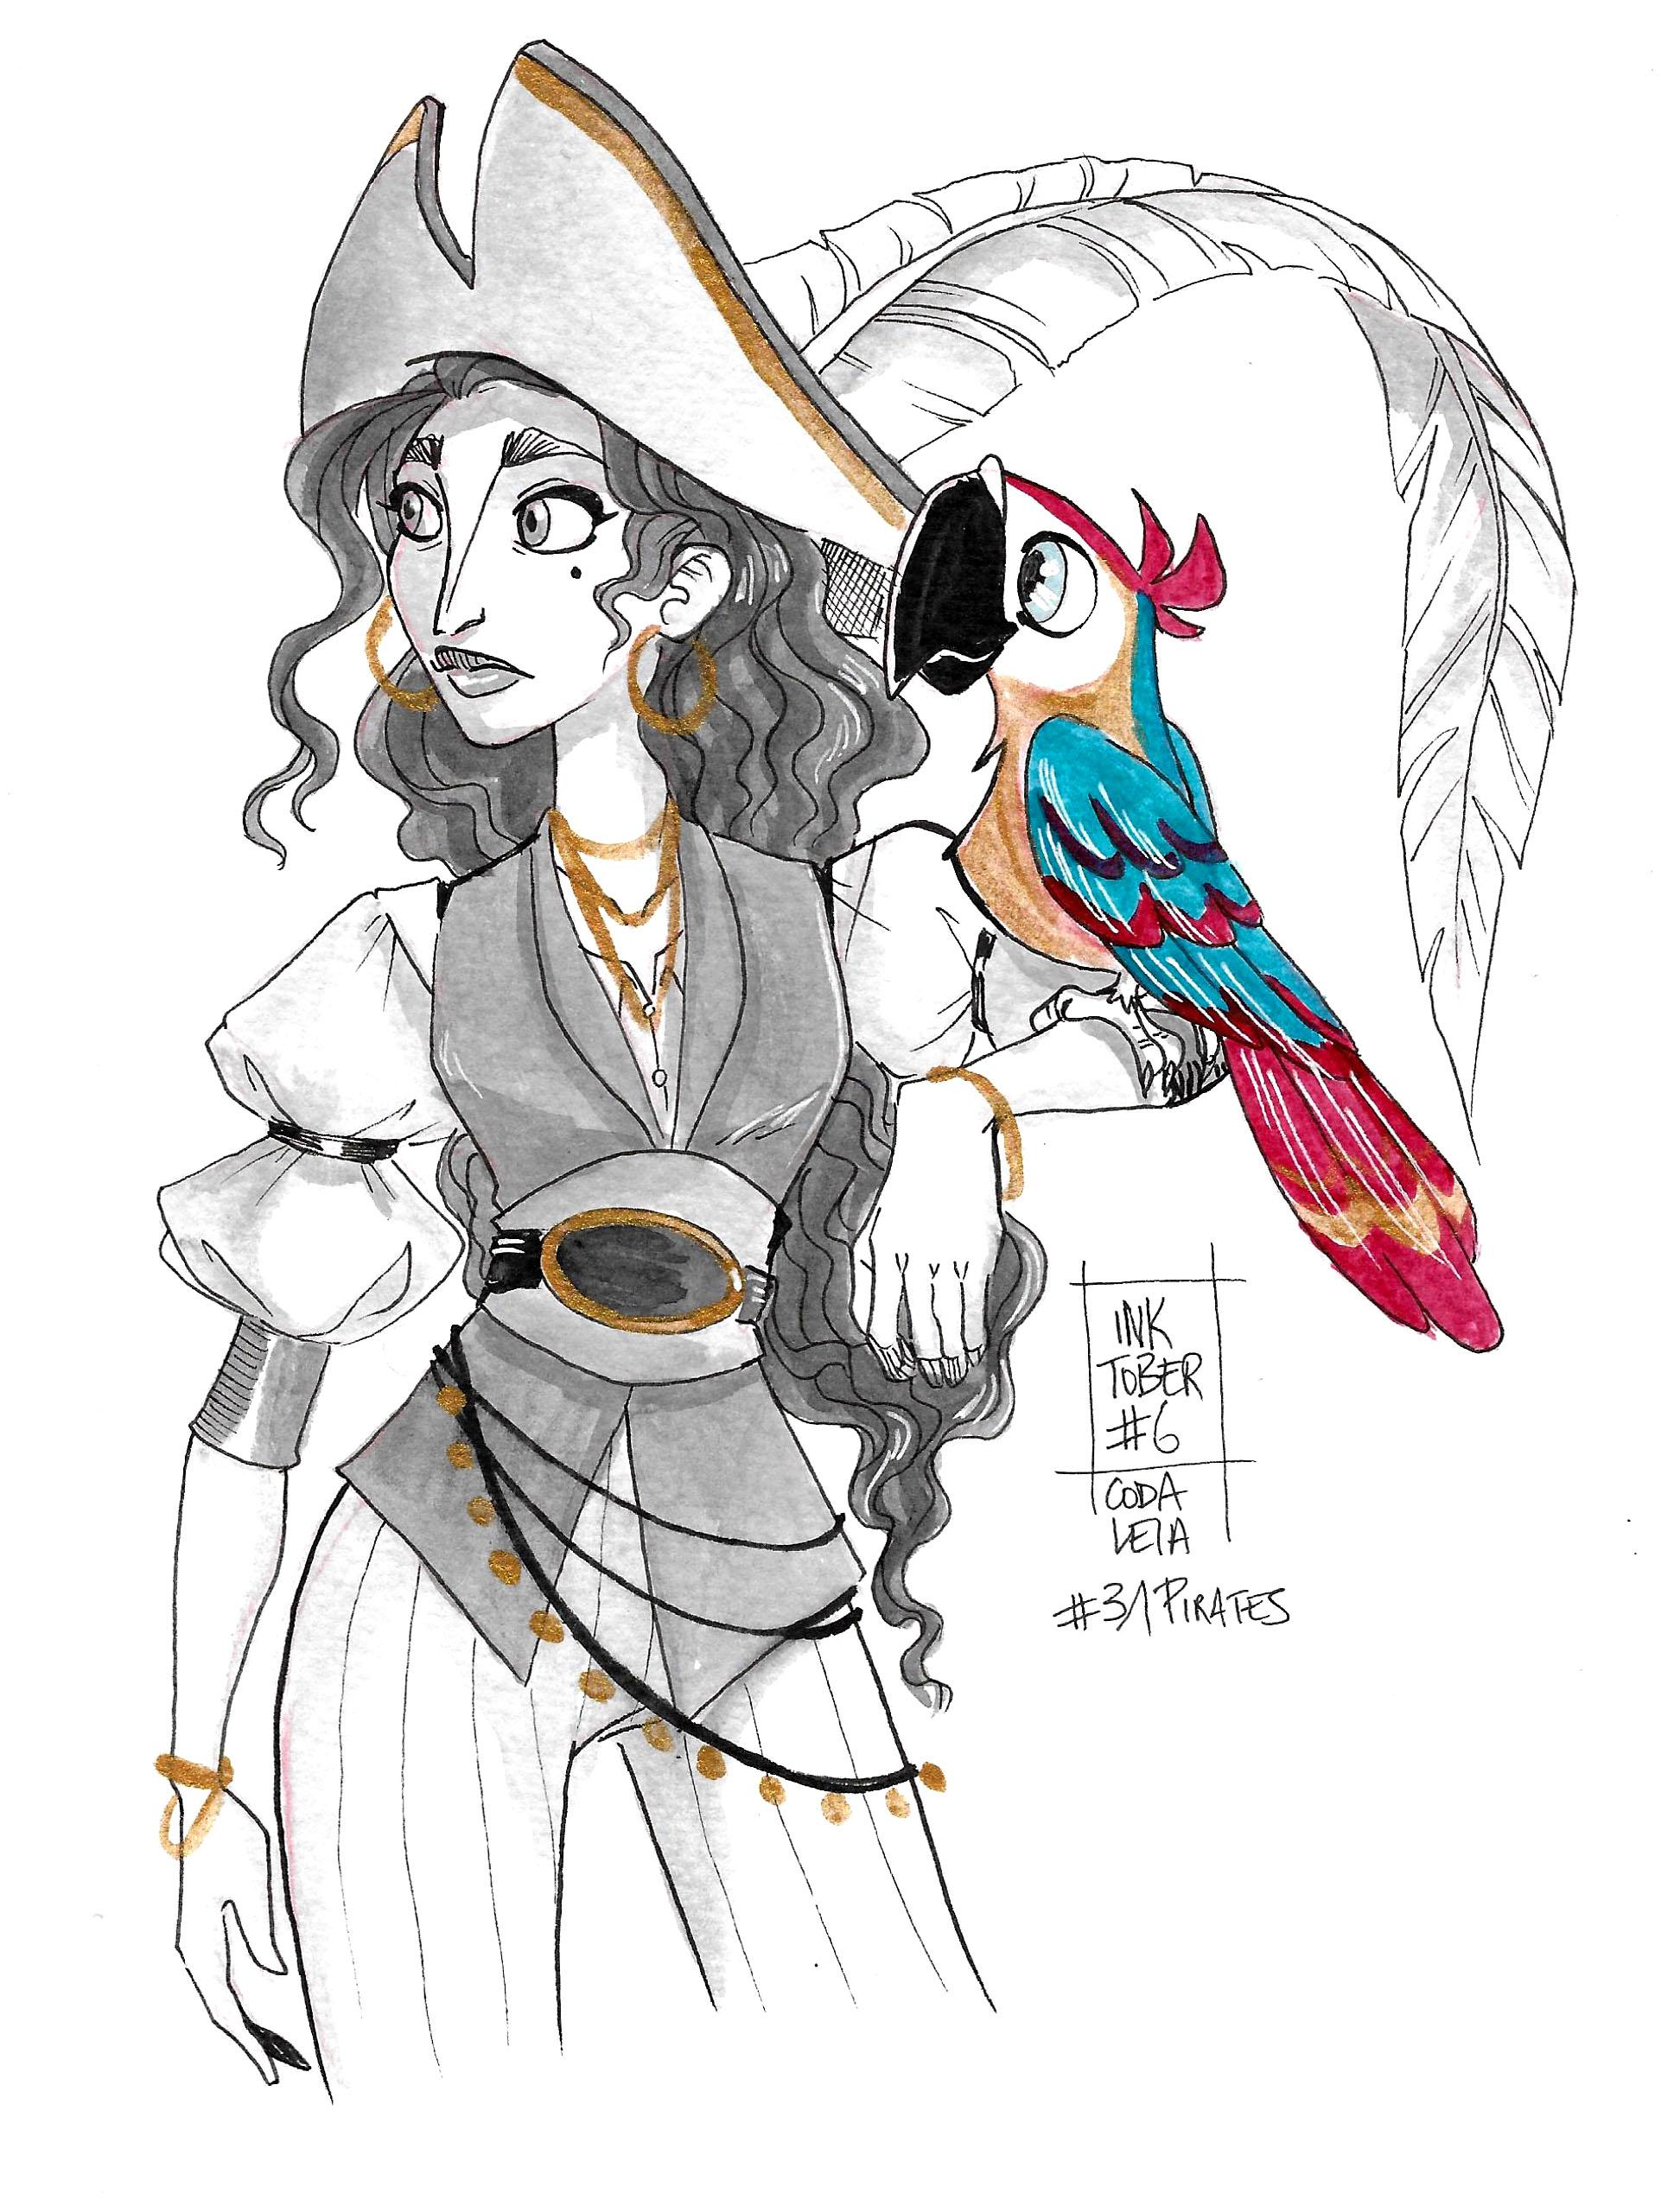 31 Pirates - Parrot